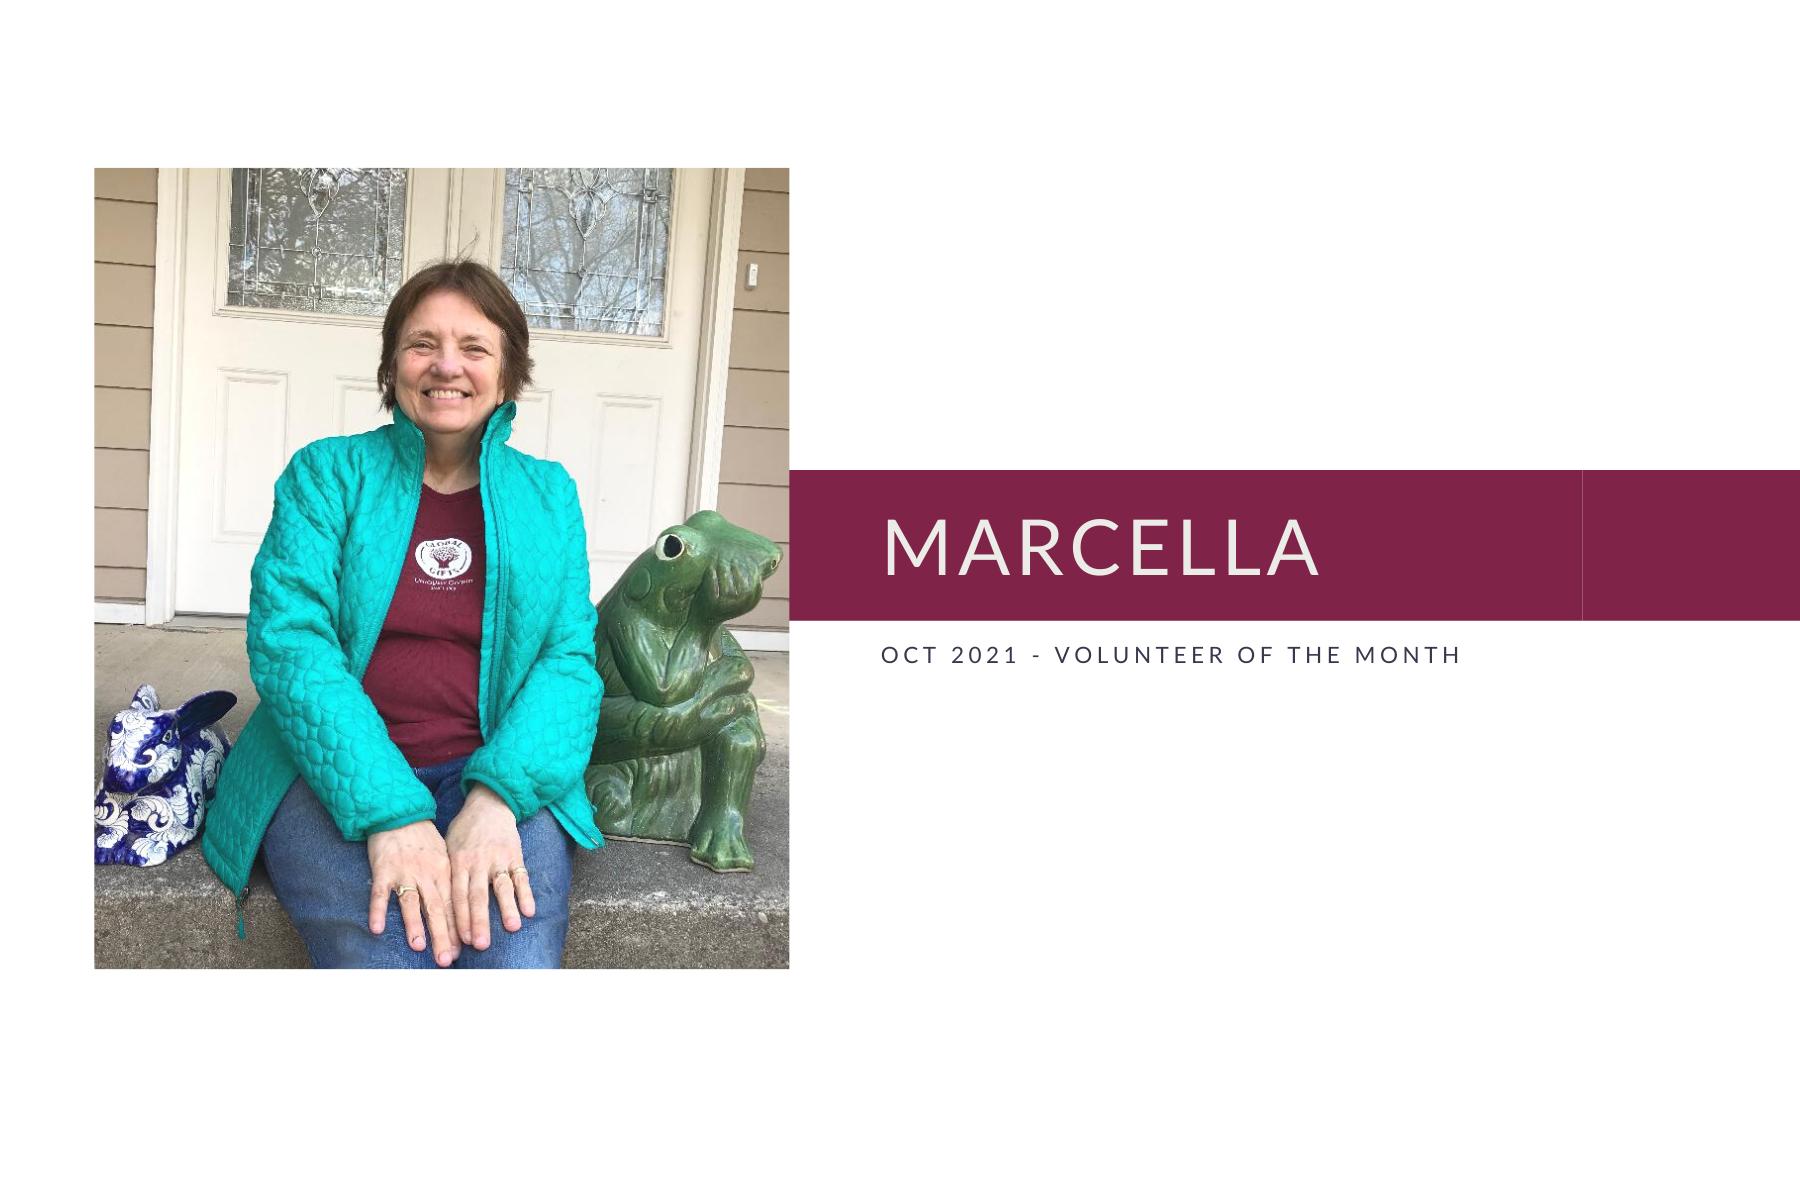 Meet Marcella: Volunteer of the Month (October 2021)